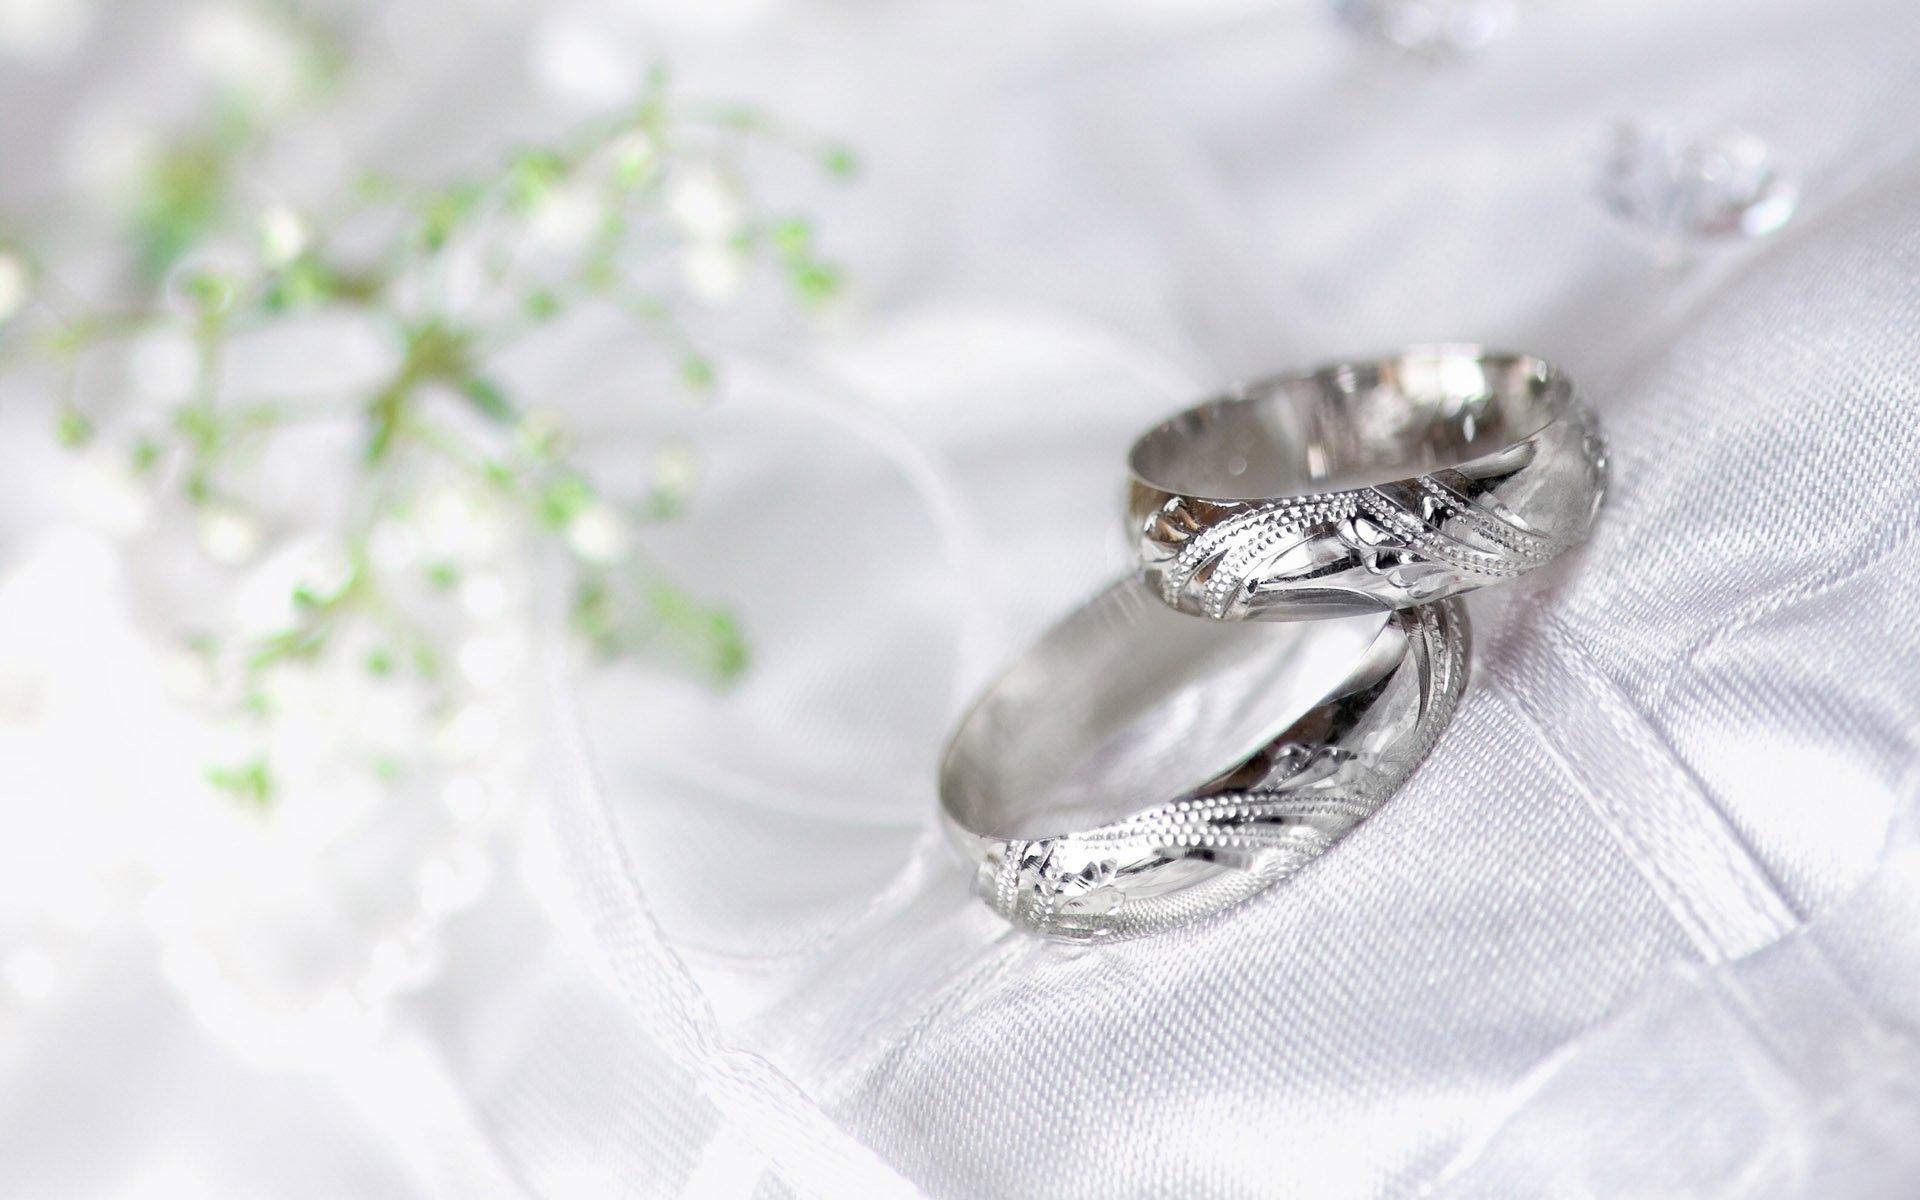 Inexpensive wedding rings Wedding ring background images 1920x1200